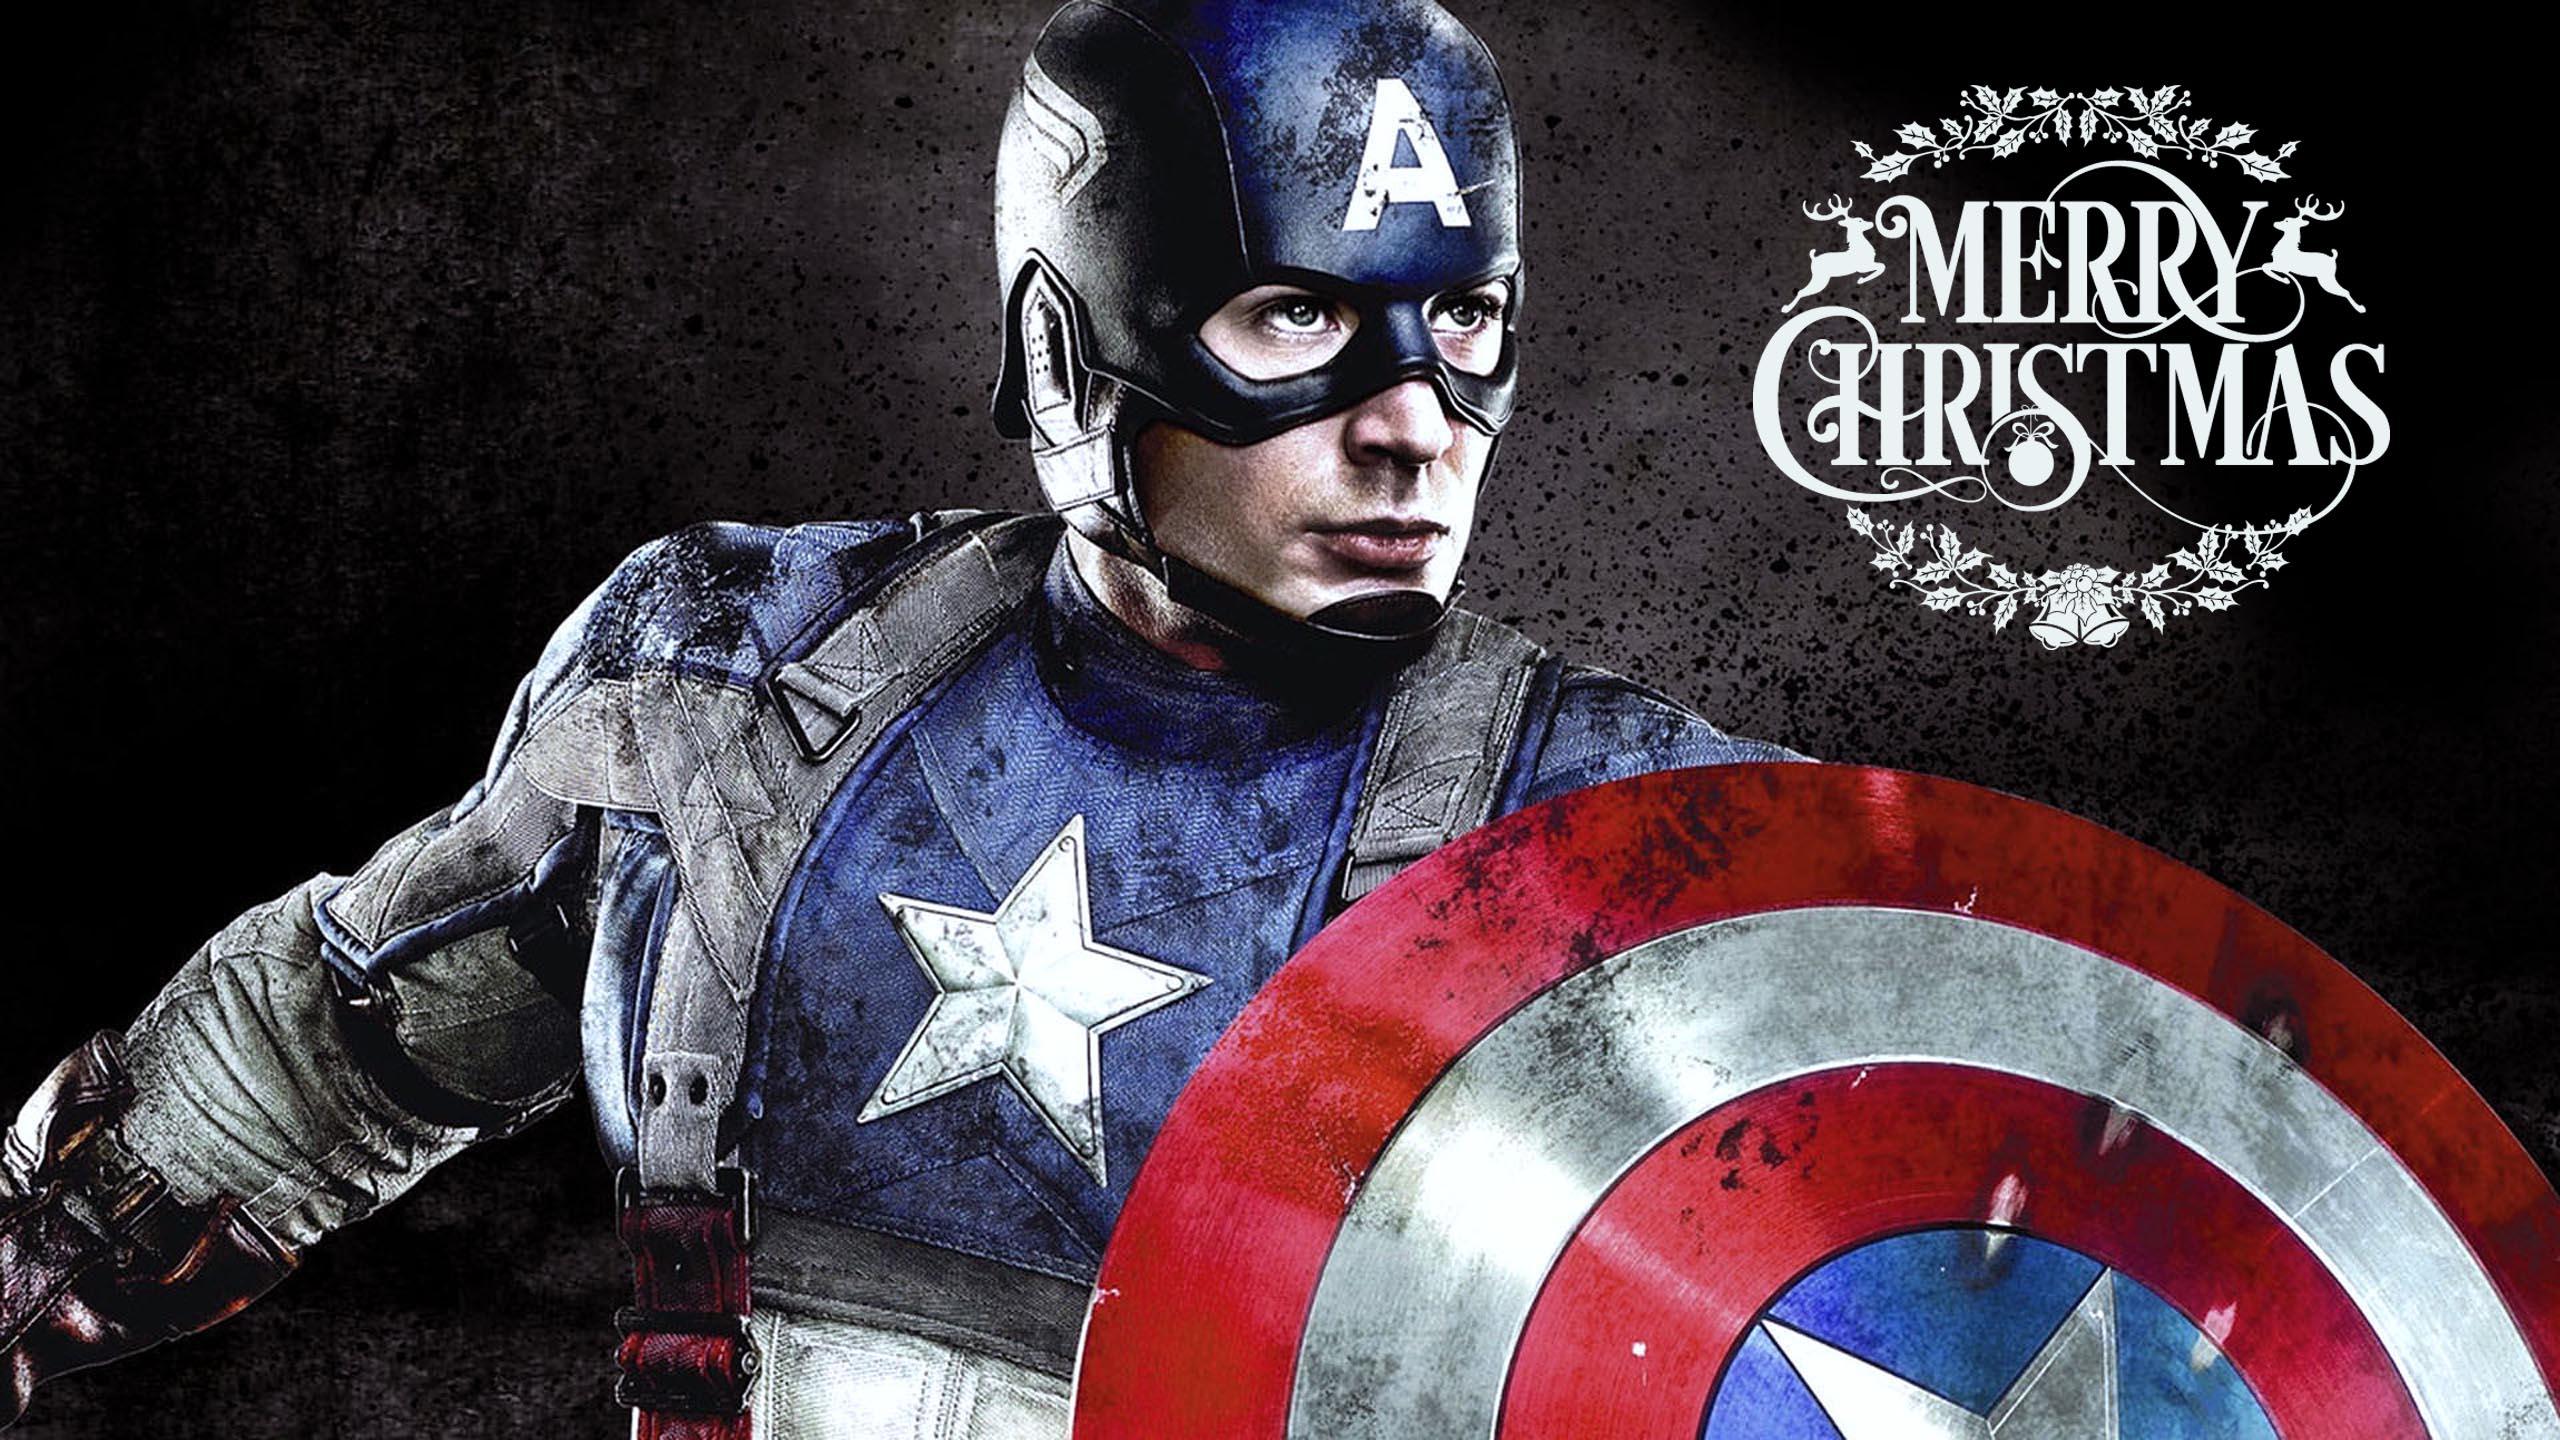 happy merry christmas greetings super hero captain america kids hd wallpaper